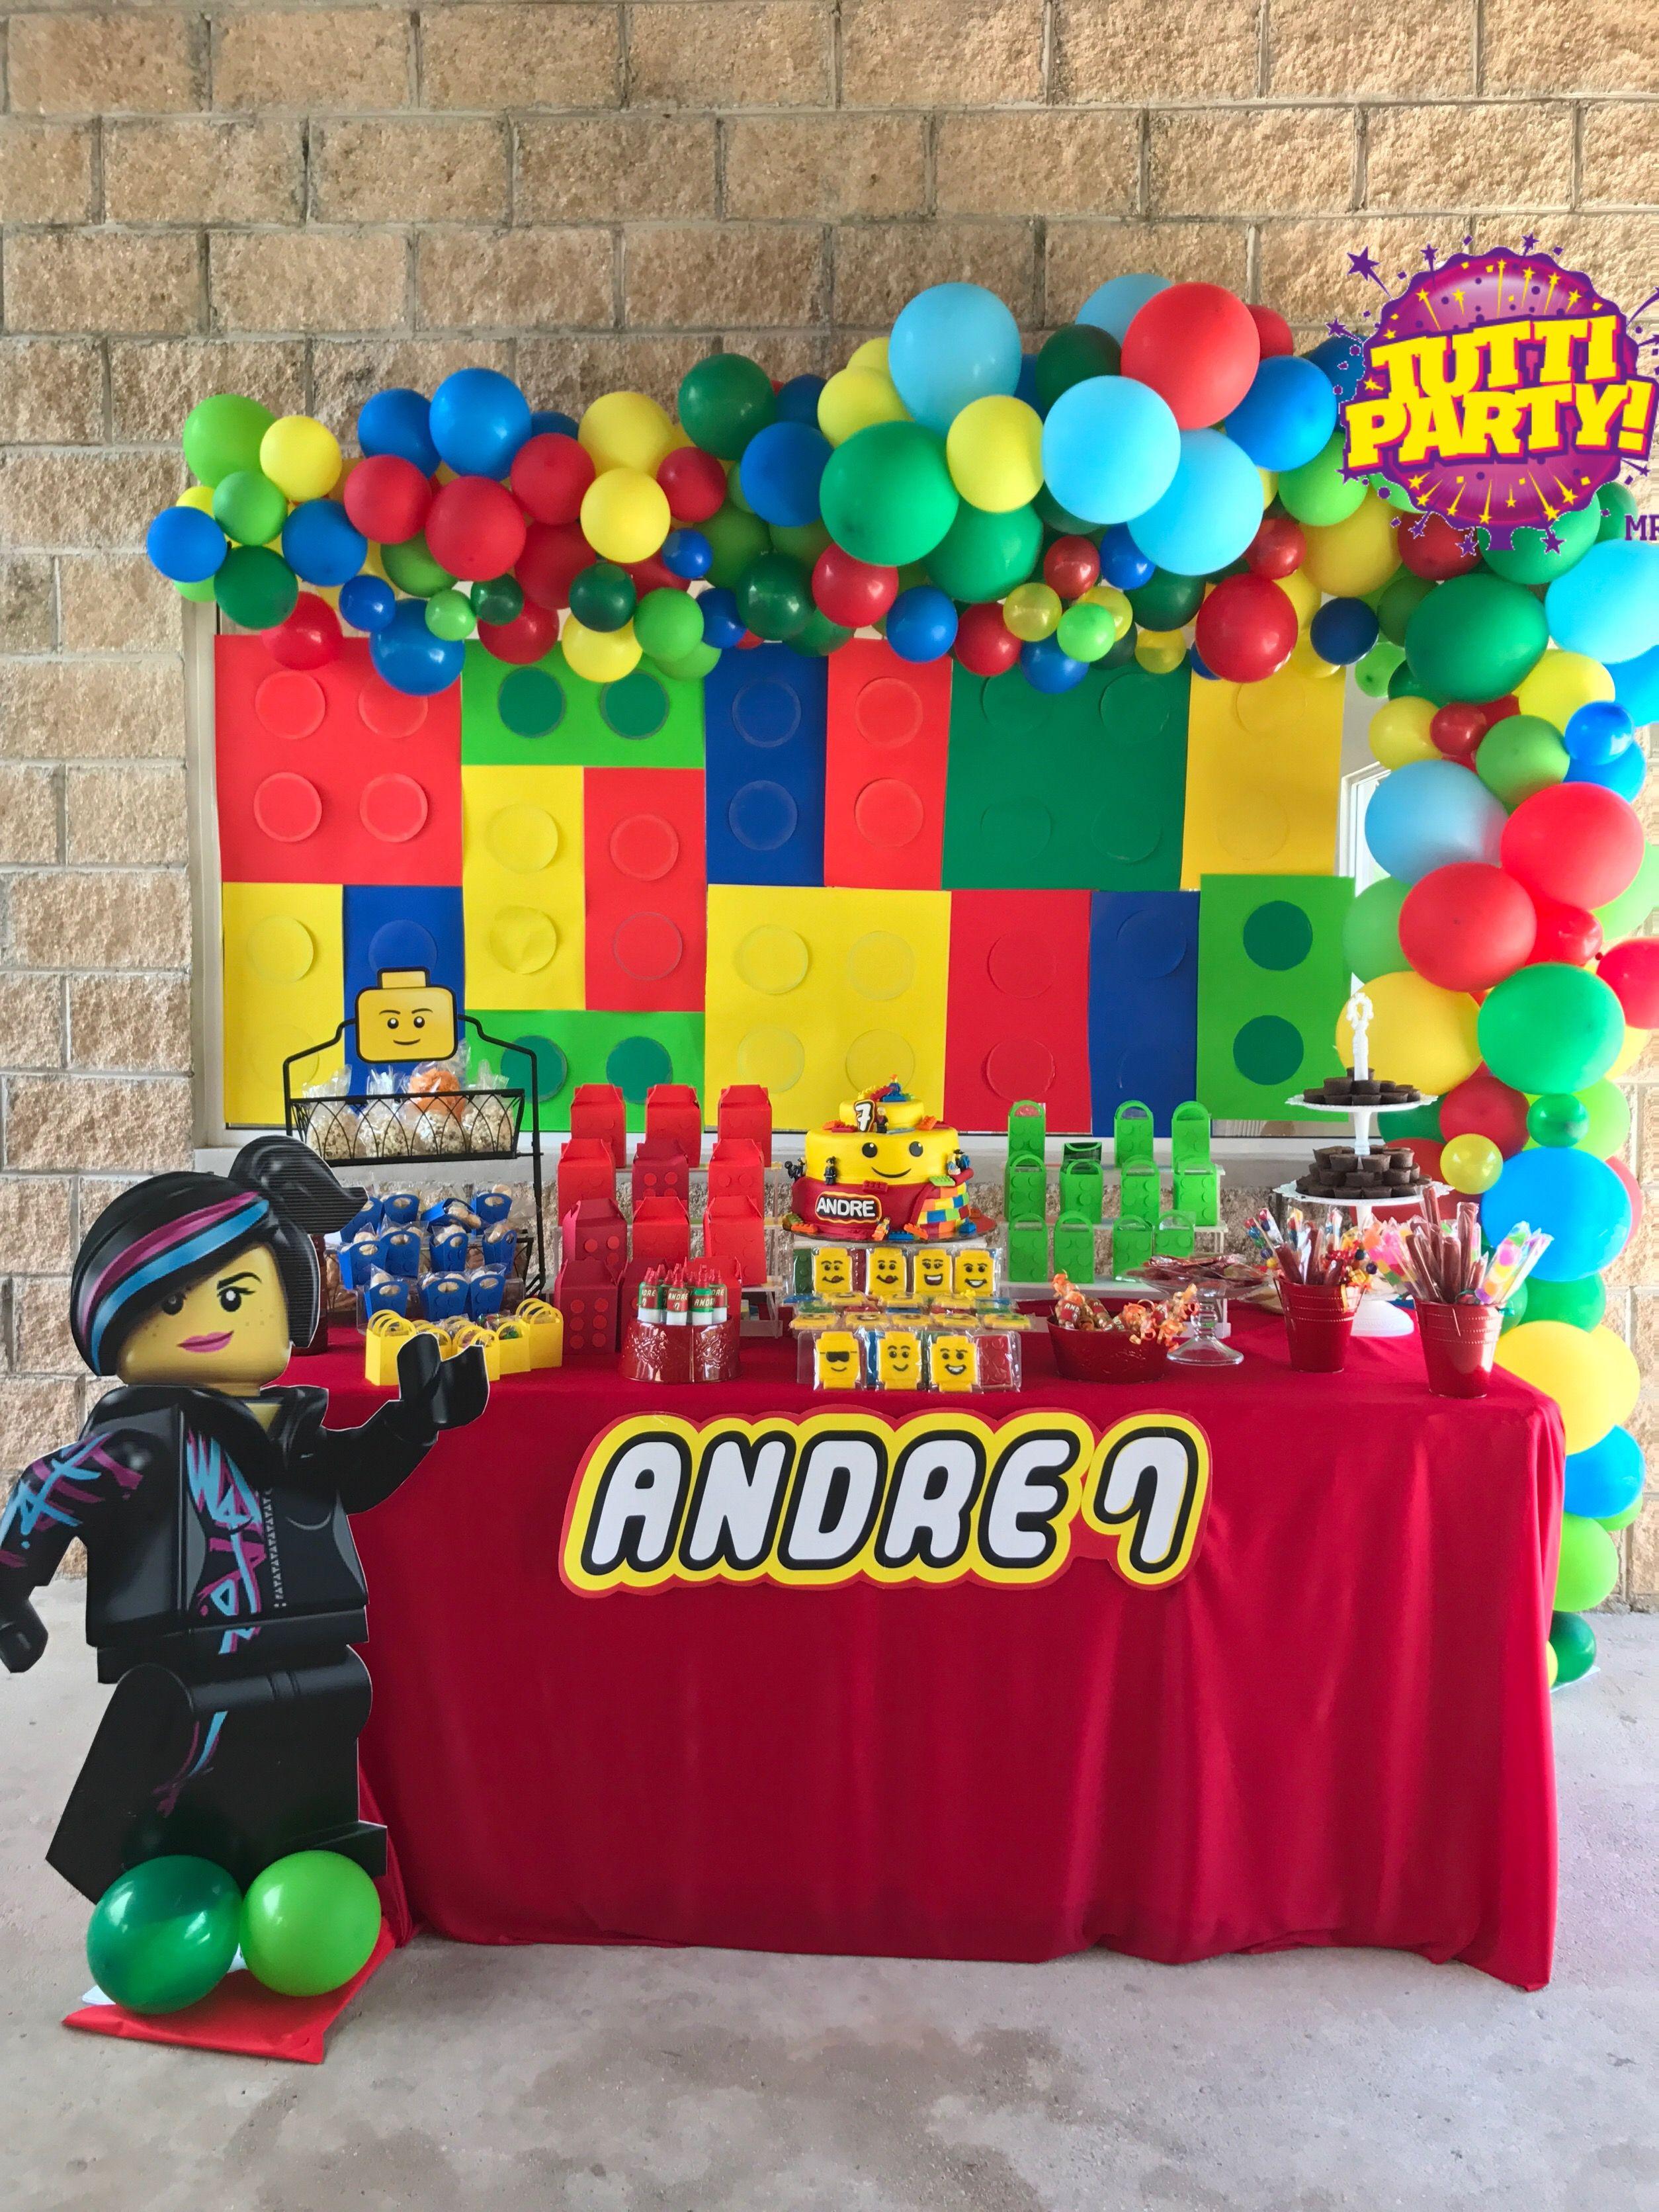 Lego Party Decorations Lego City Party Ideas Lego